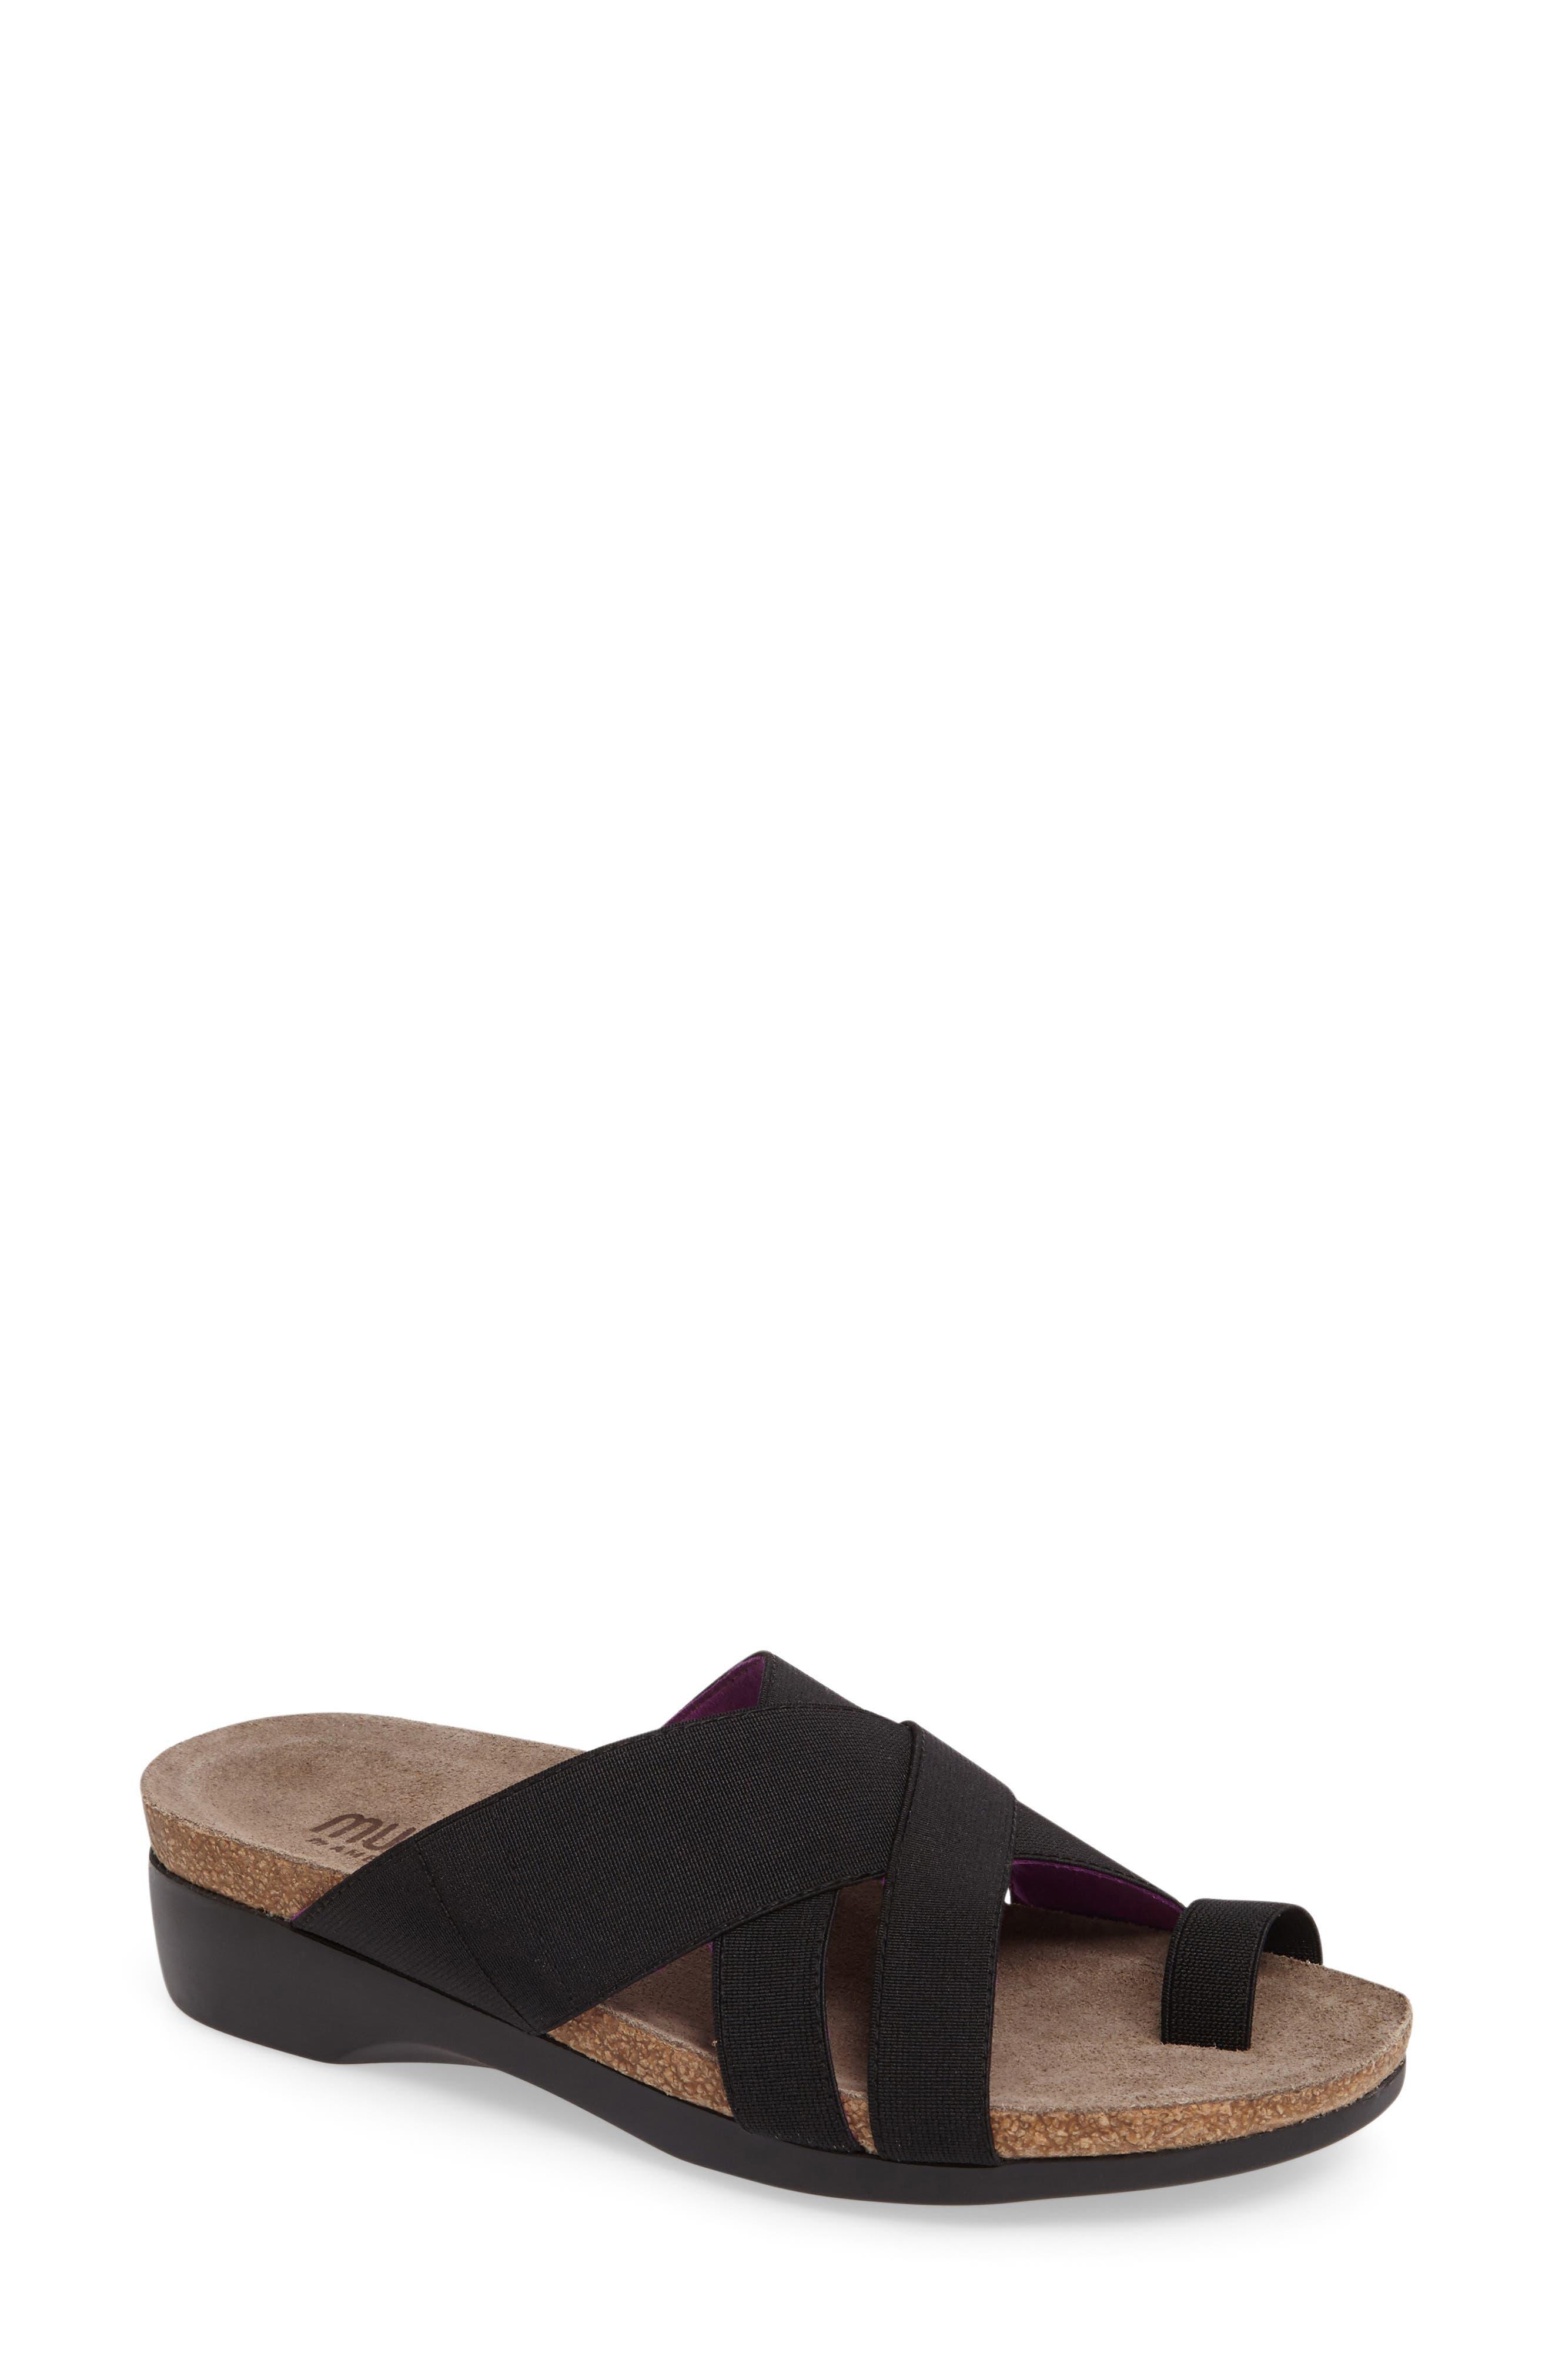 Delphi Slide Sandal,                         Main,                         color, 001